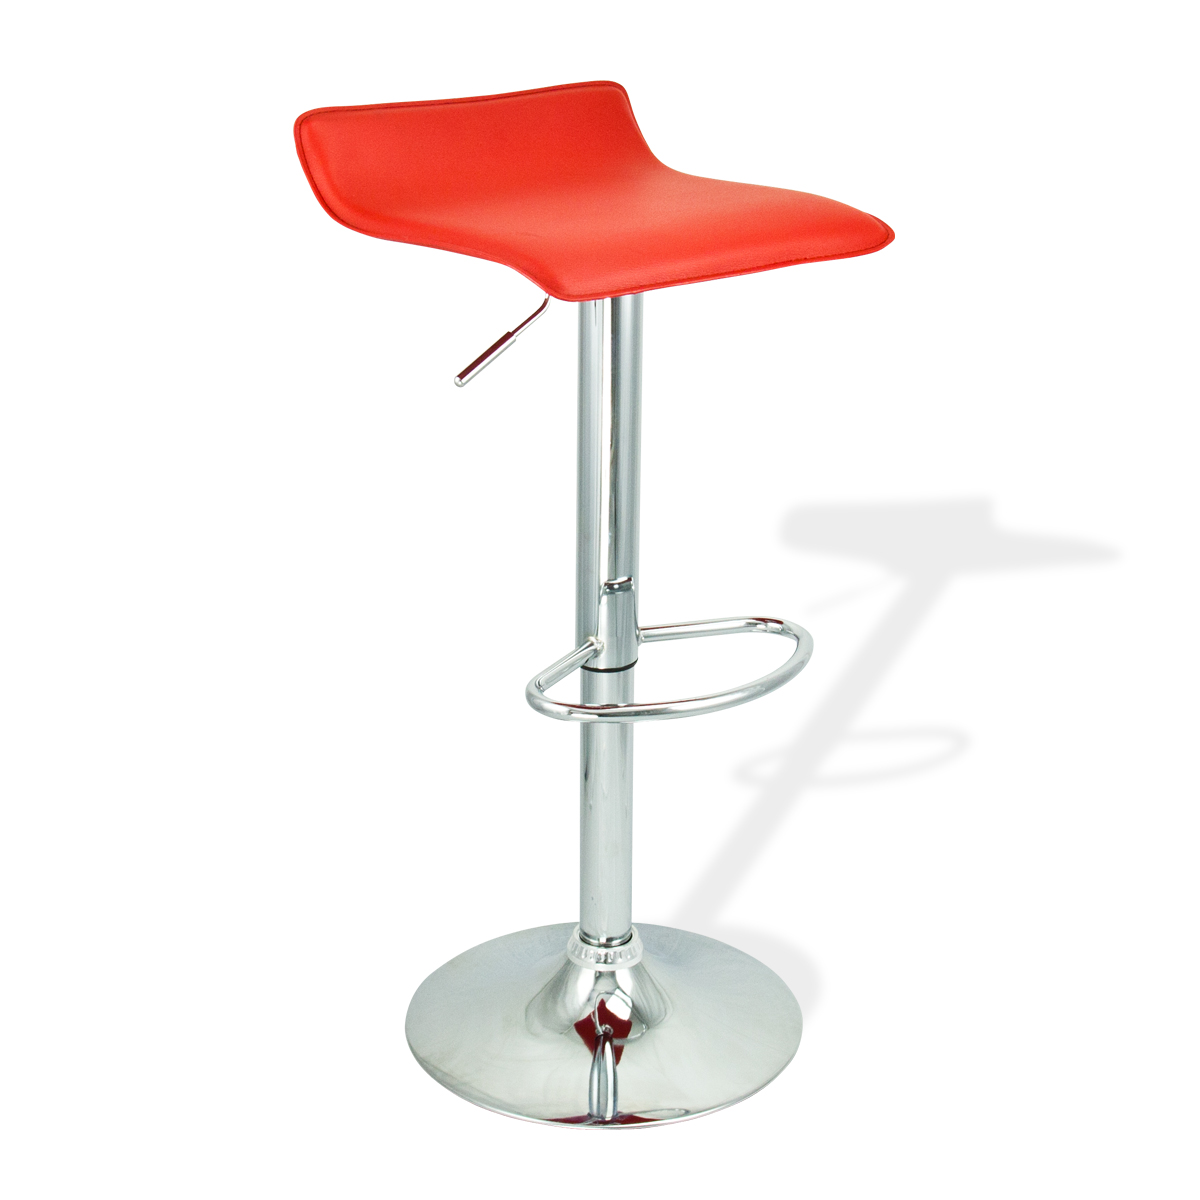 4 new modern bar stool red swivel bombo chair pub barstools